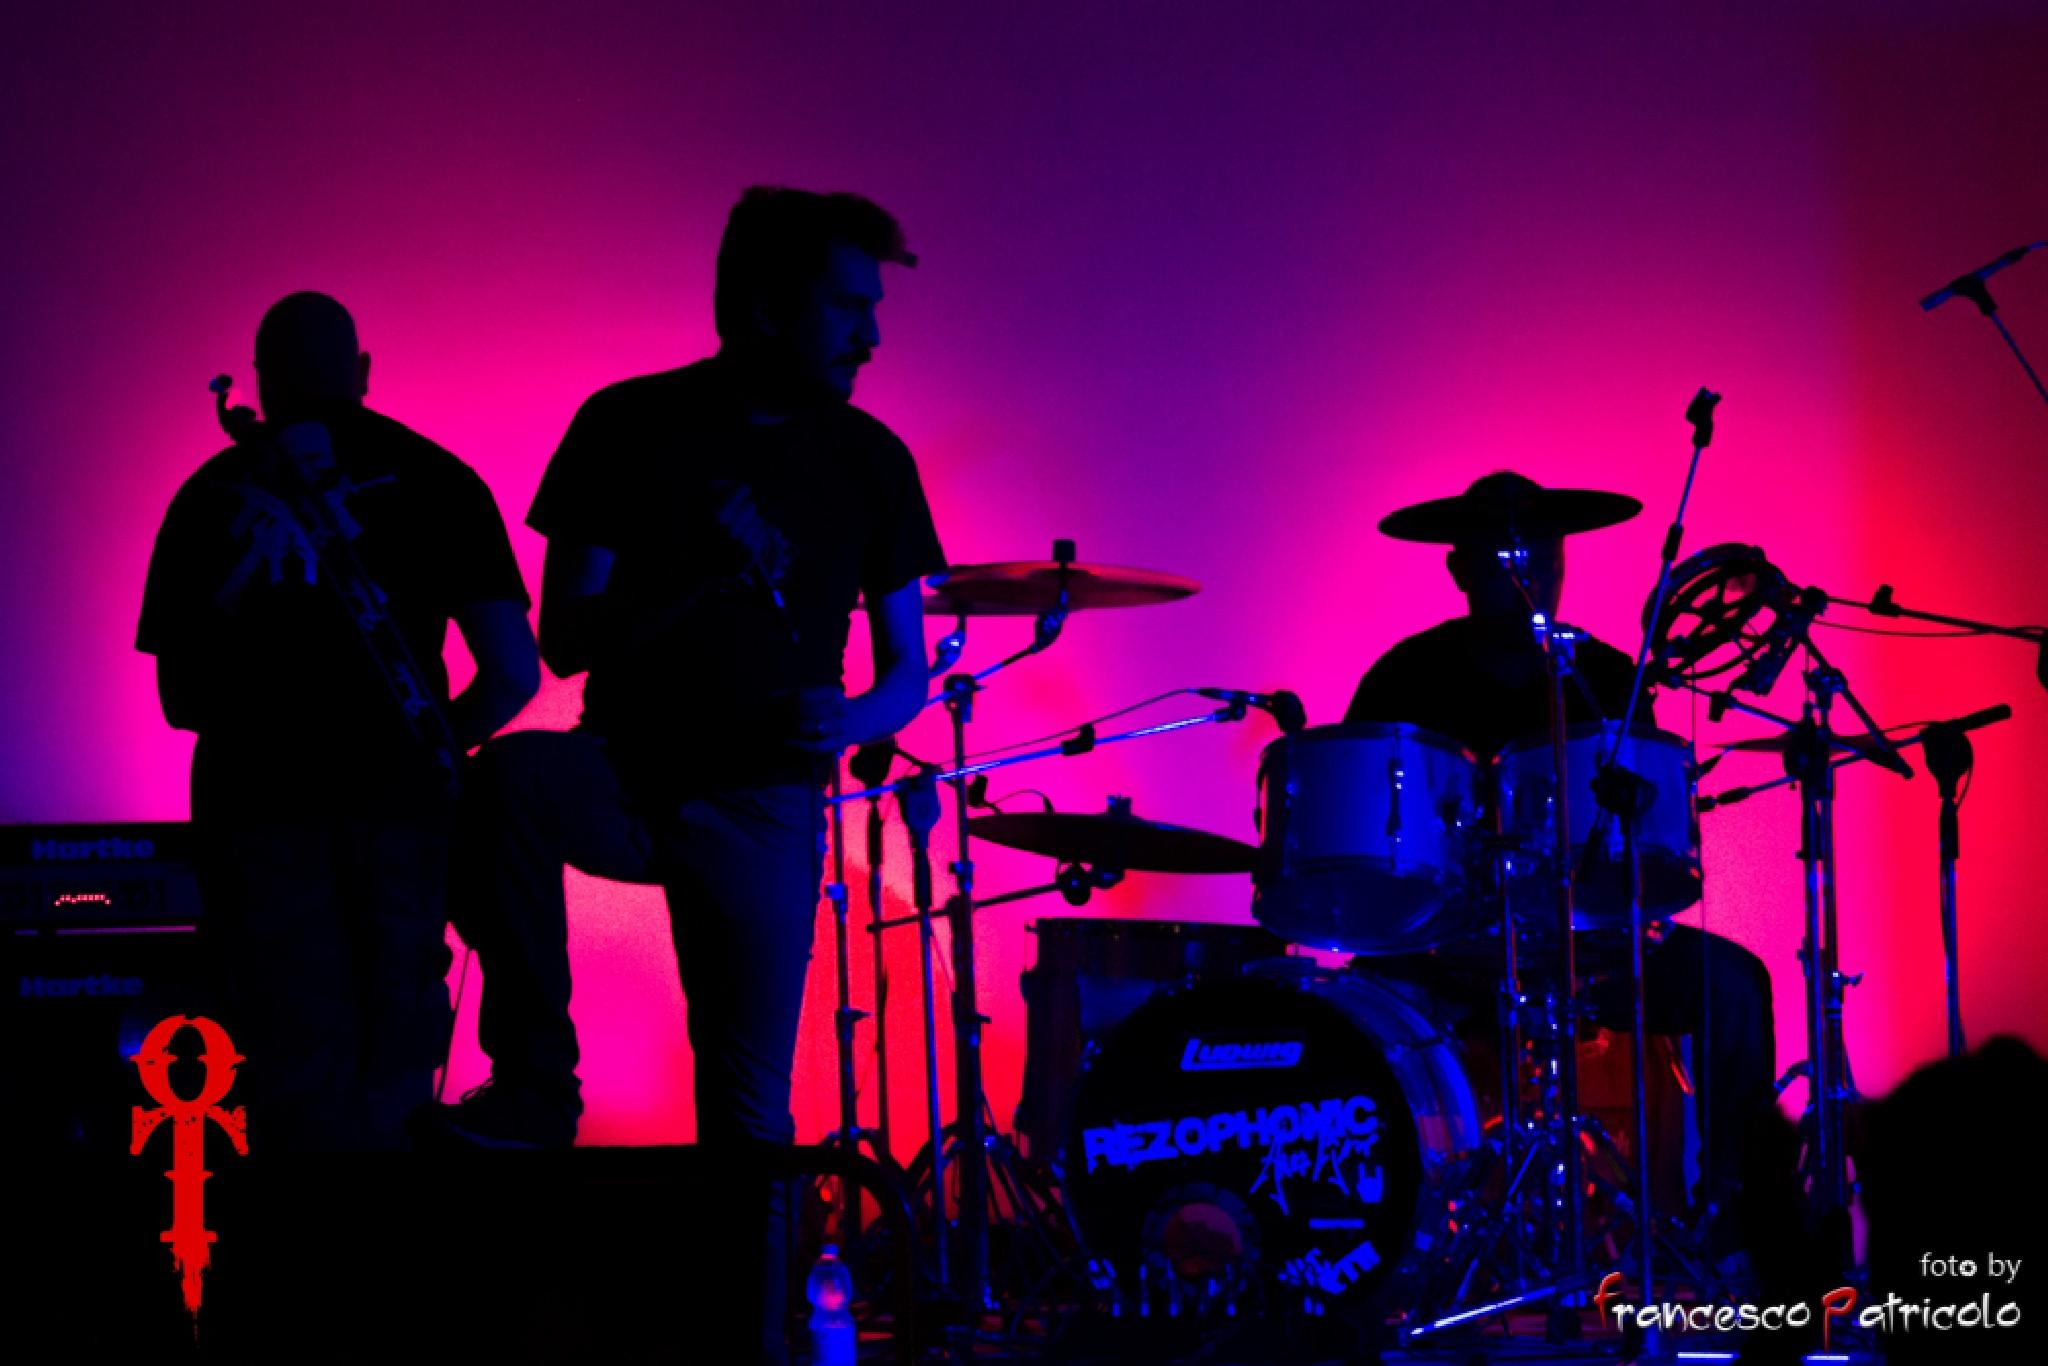 Metal concert by FrancescoPatricolo